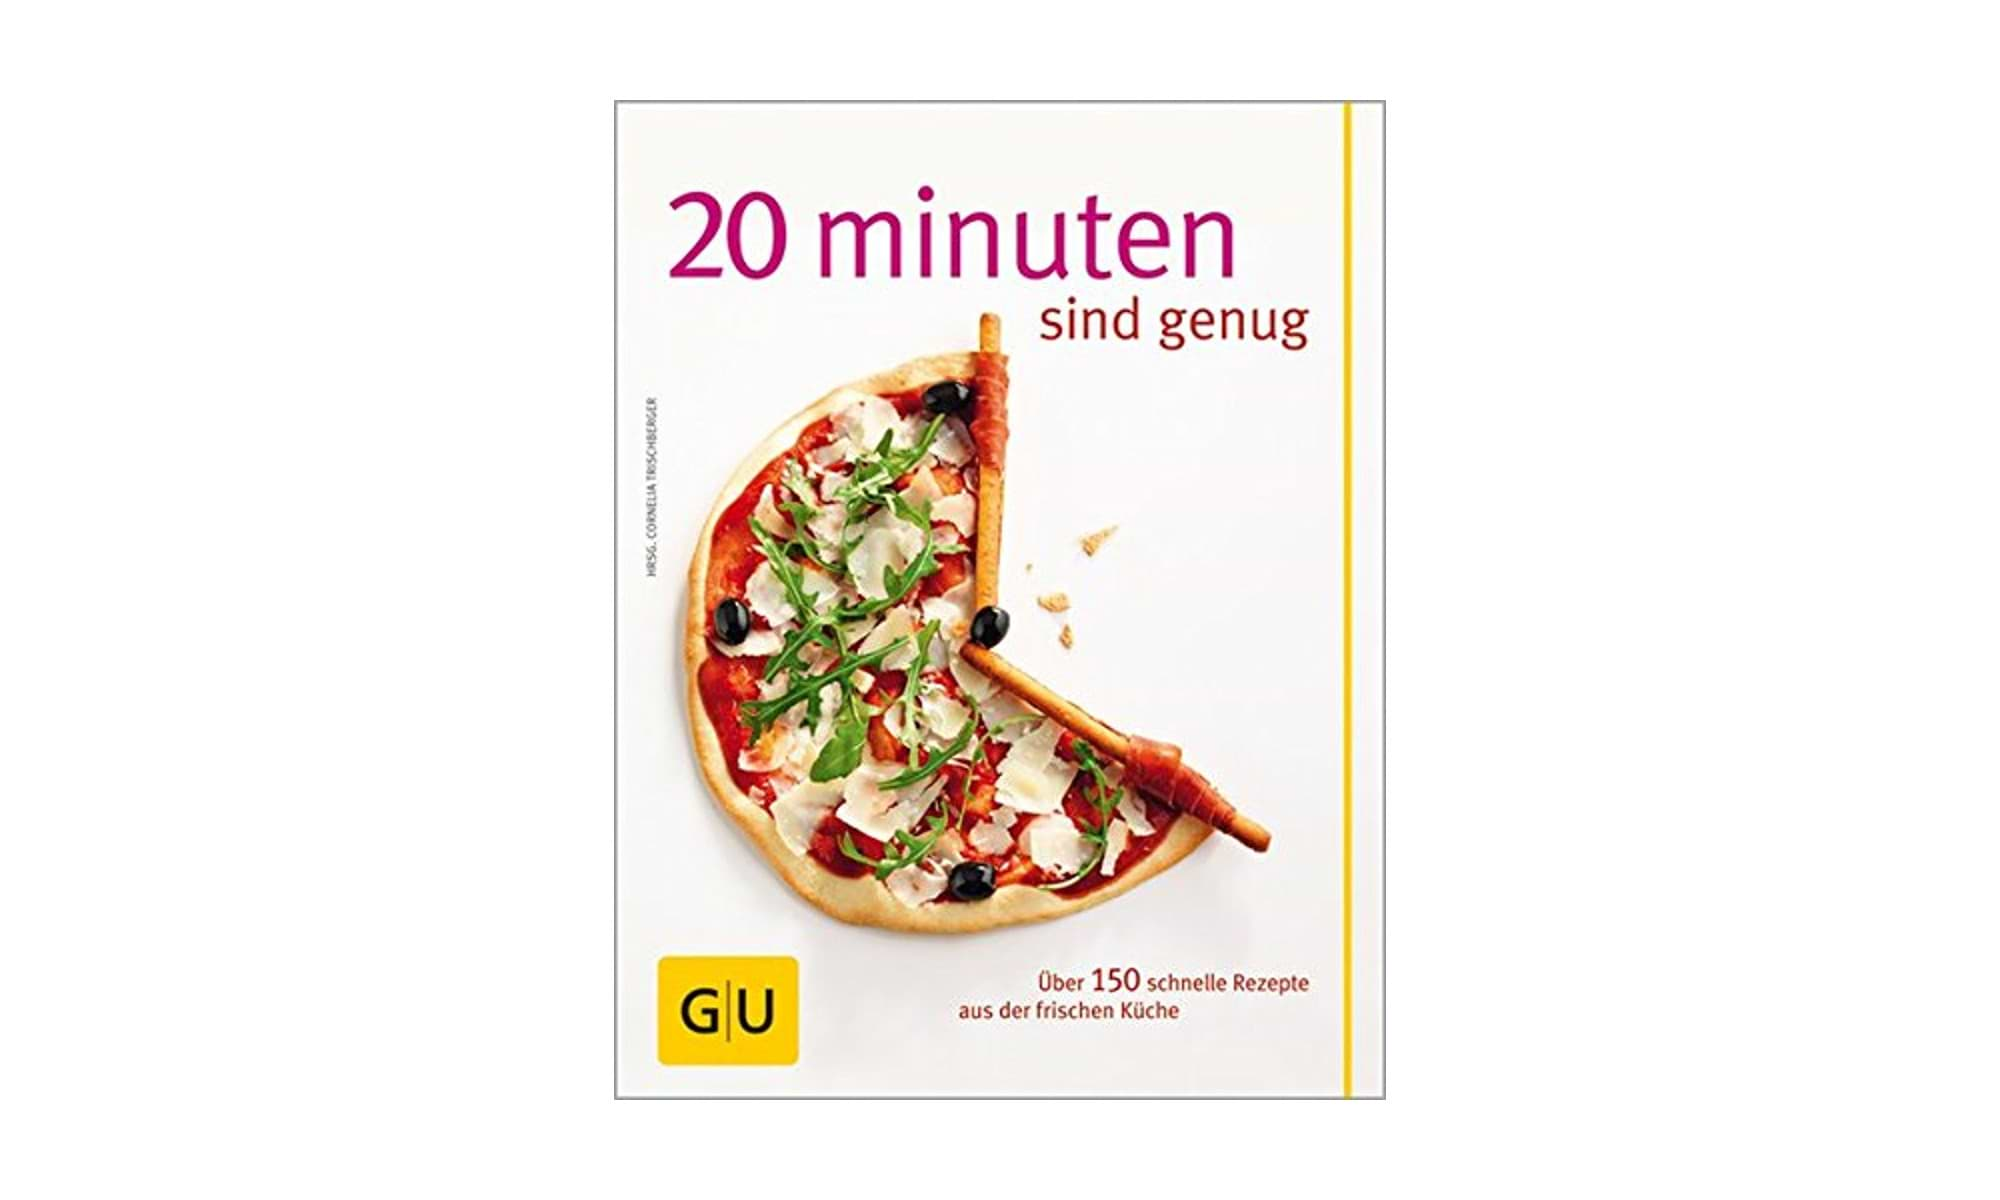 Camping Kochbuch 20 Minuten sind genug